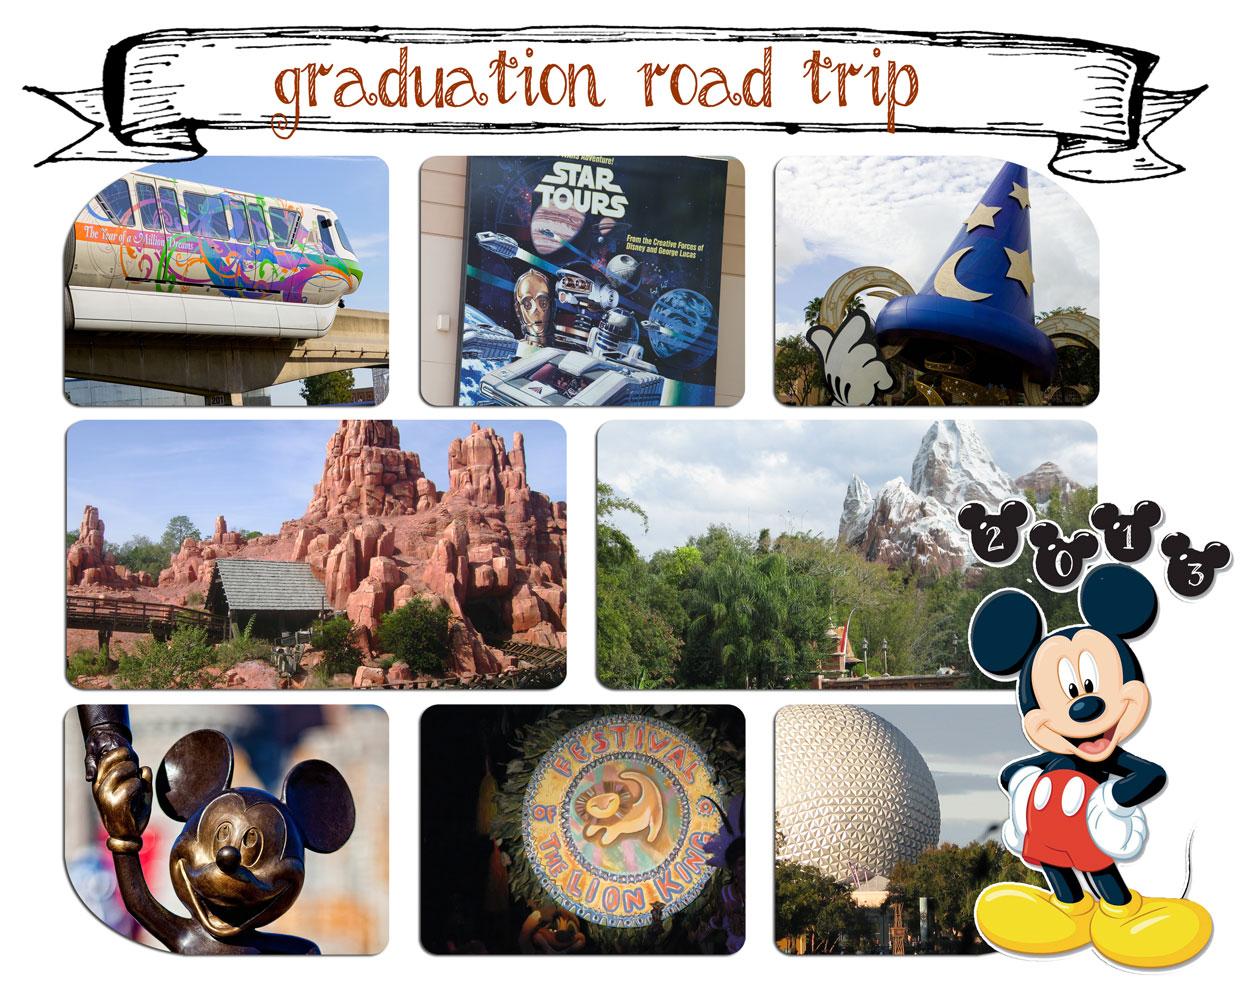 Disney Graduation Trip